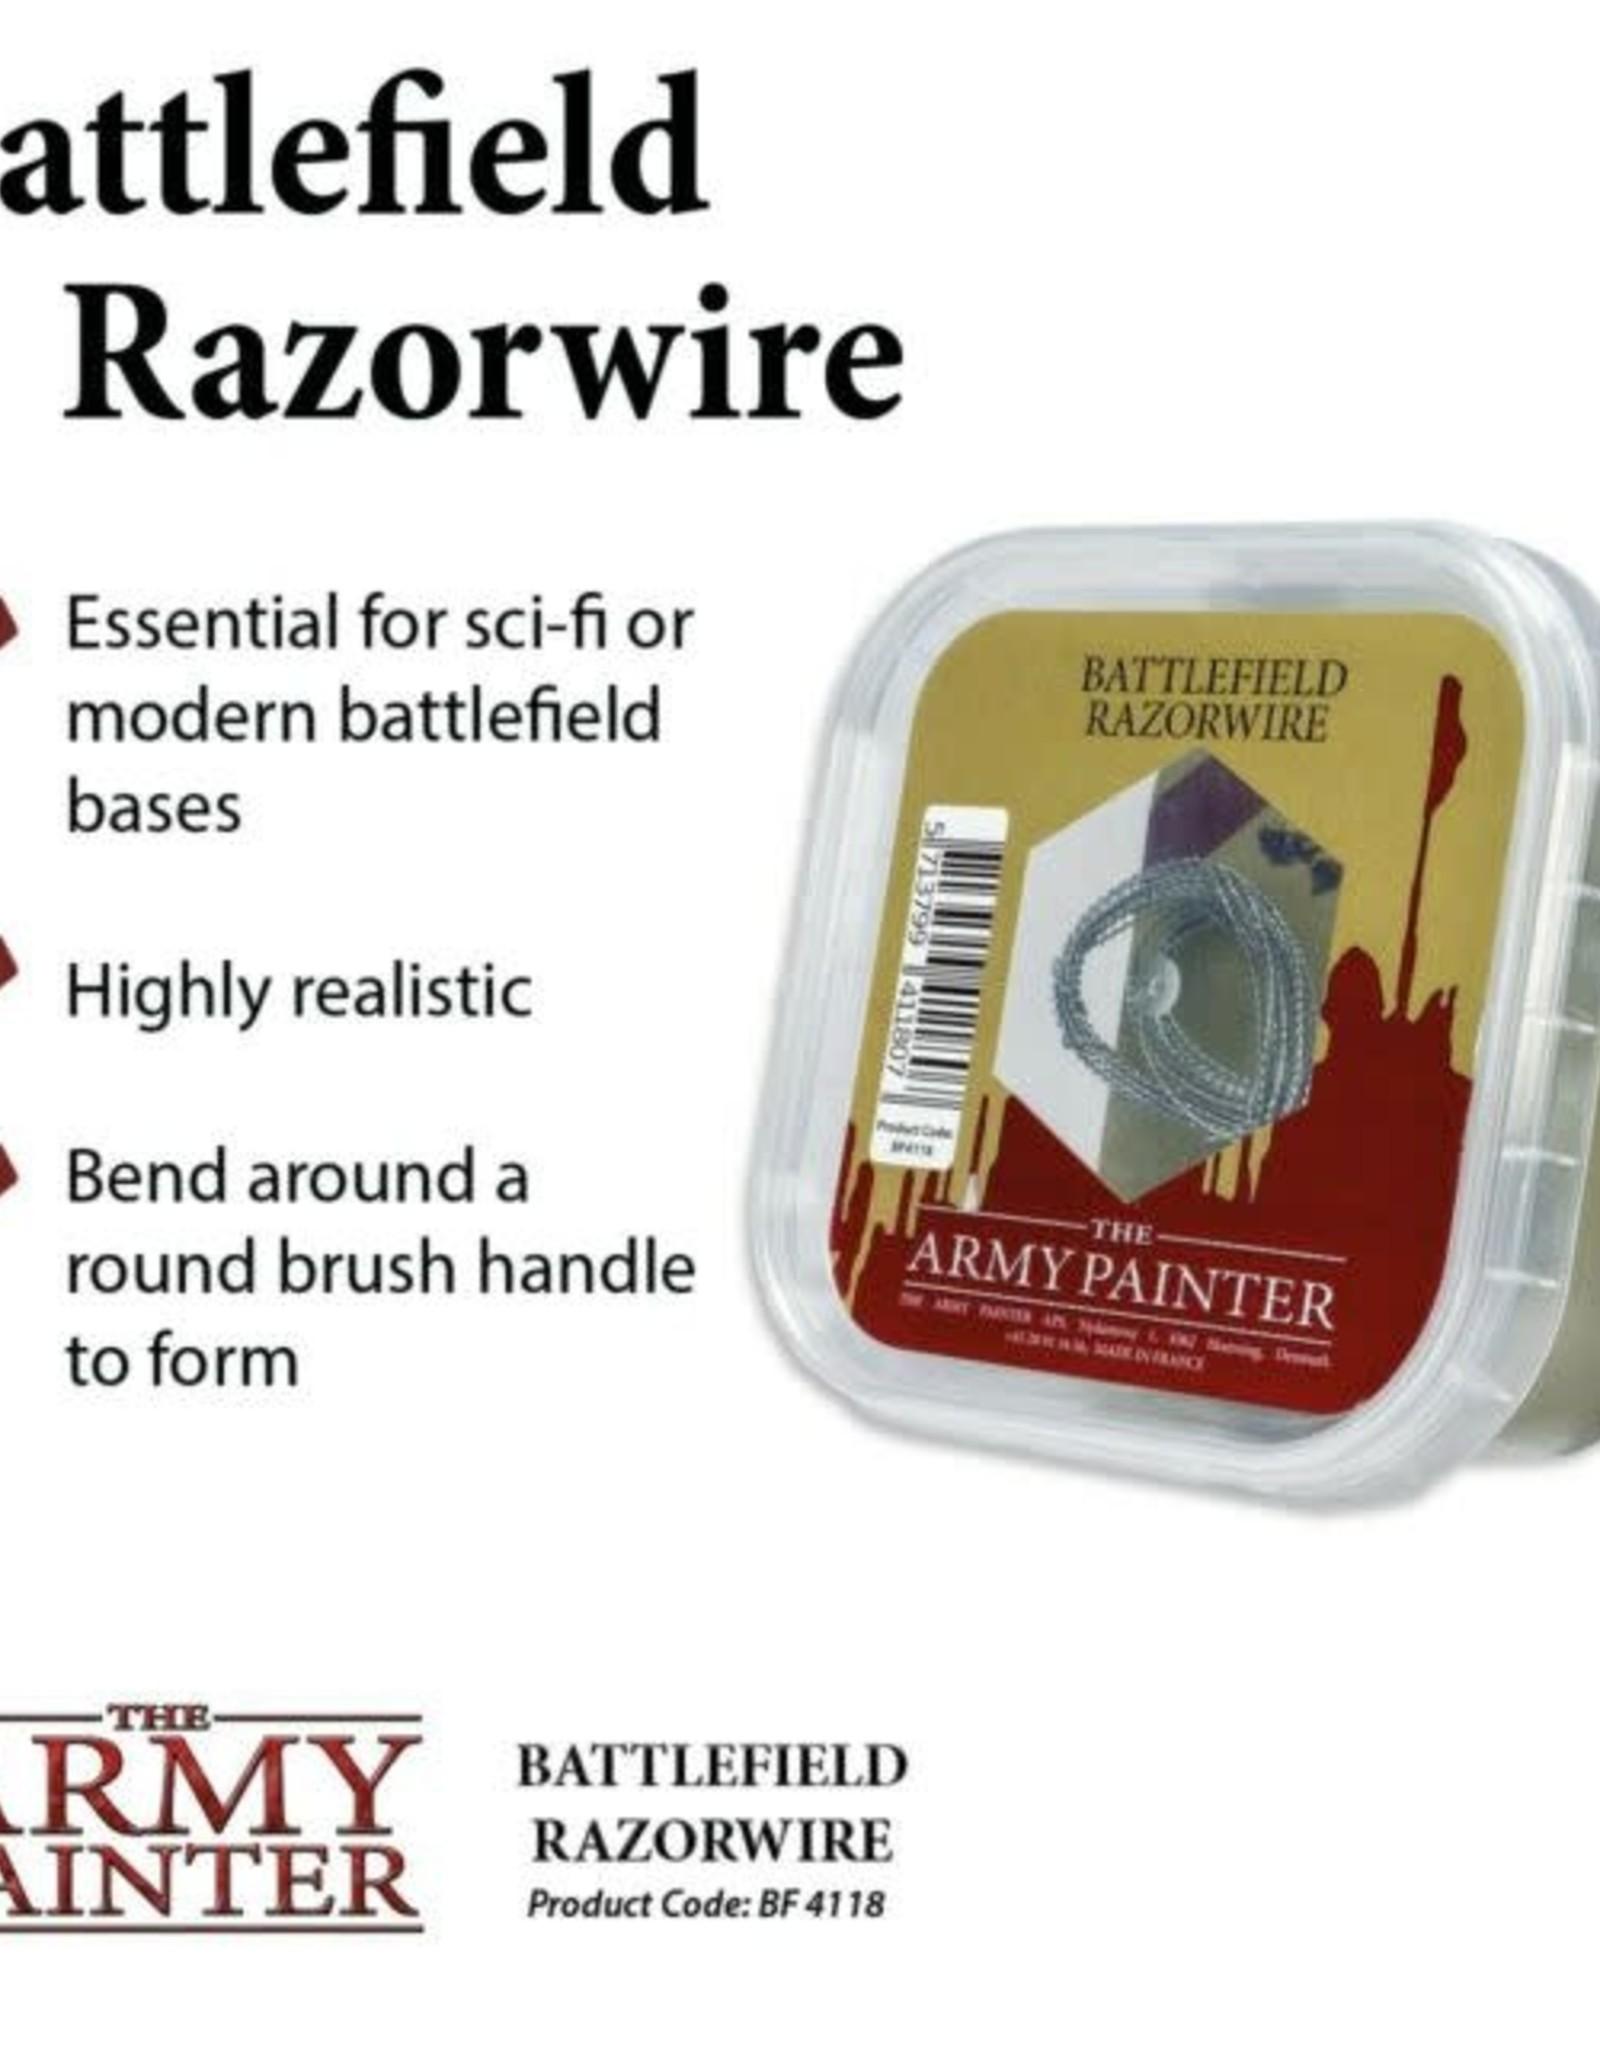 The Army Painter Battlefields: Razor Wire